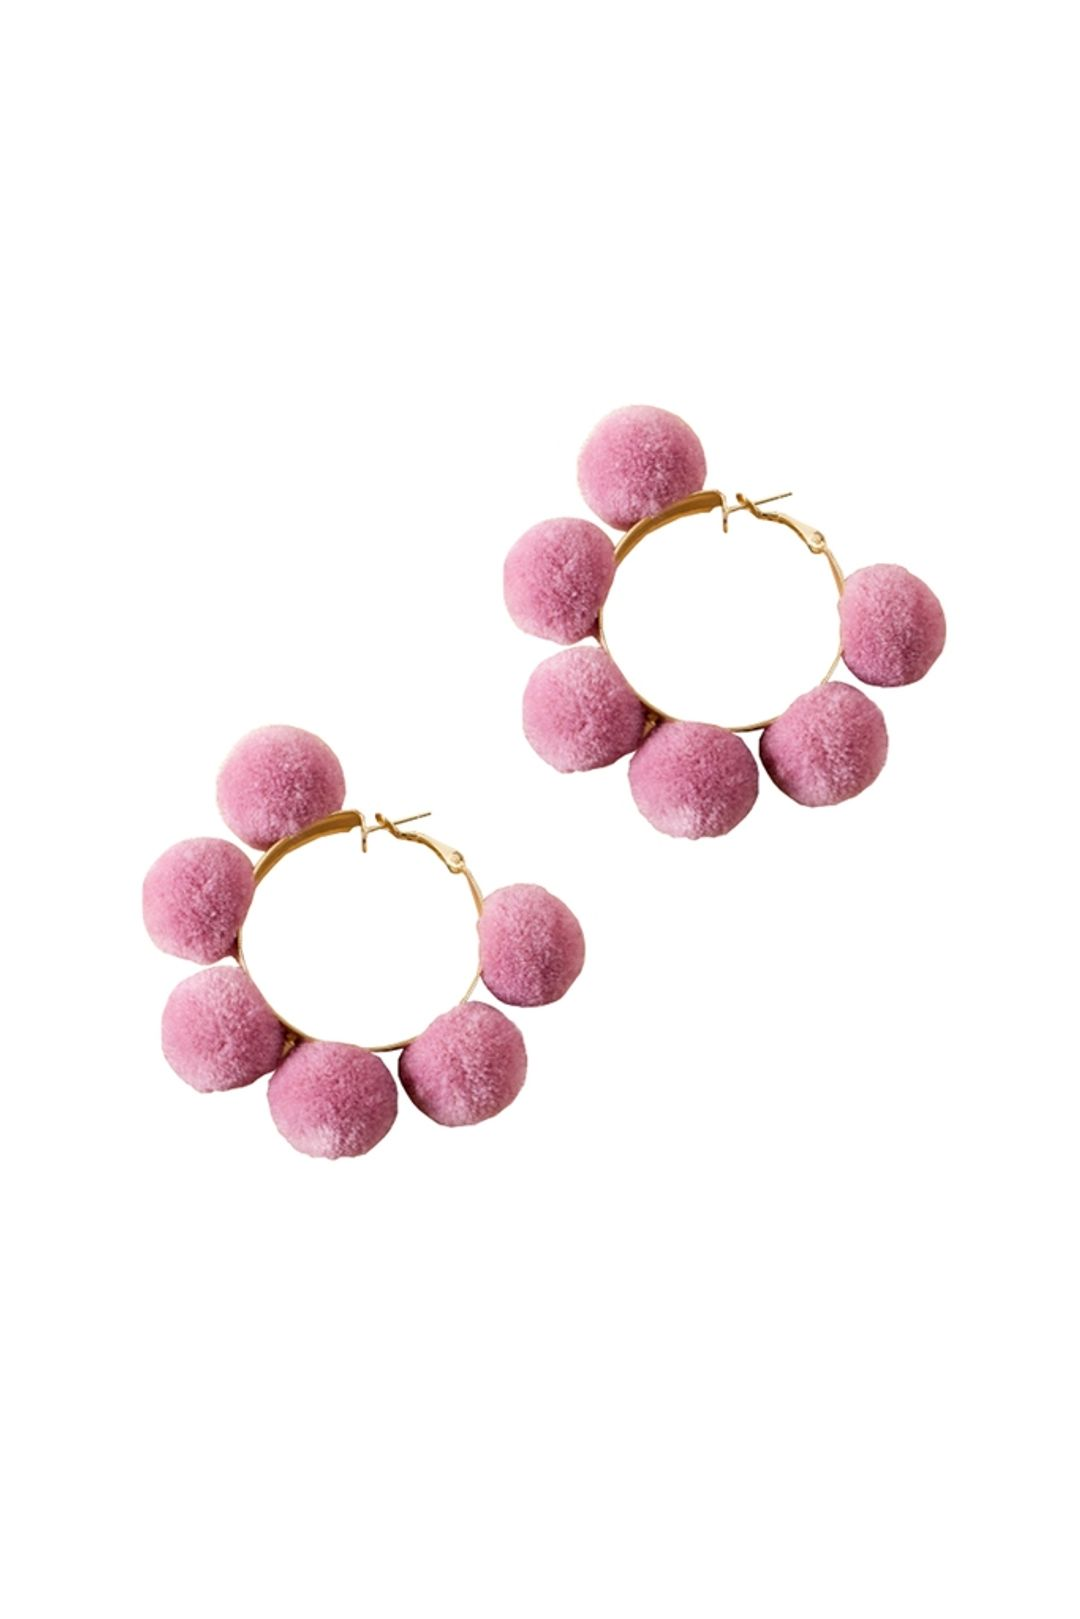 Adorne - Pom Pom Hoop Earrings - Pink Gold - Front